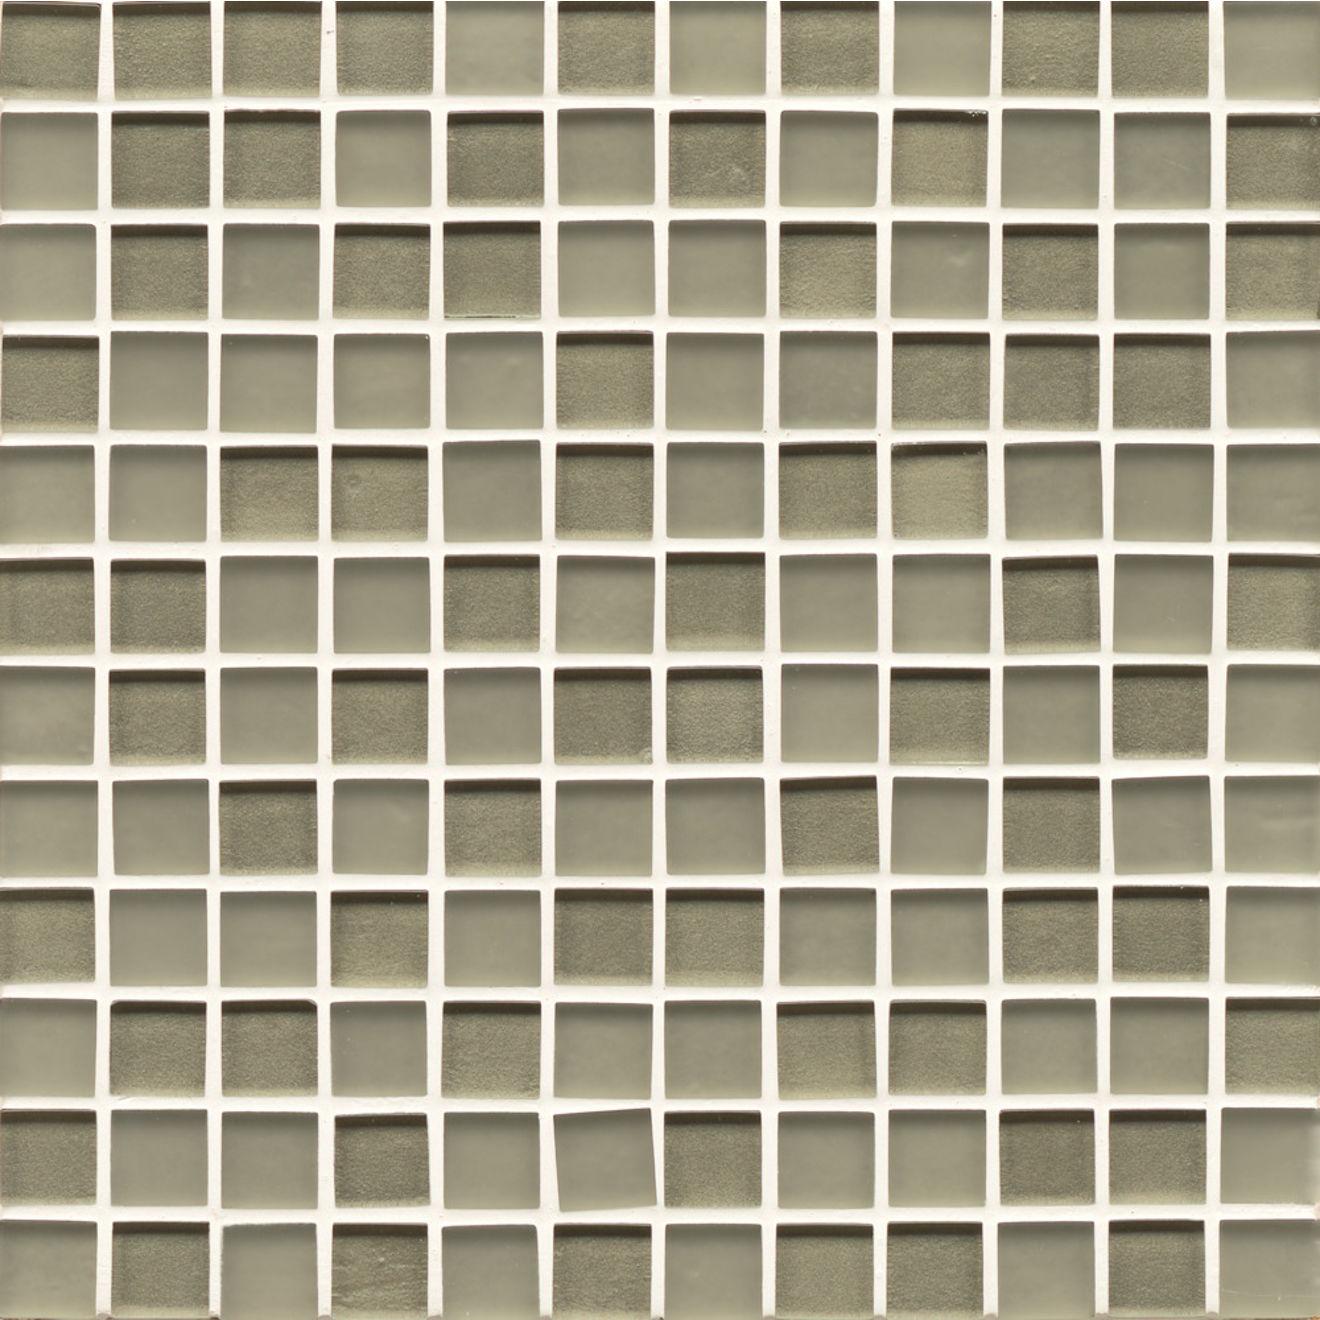 "Manhattan 1"" x 1"" Wall Mosaic in Mint"